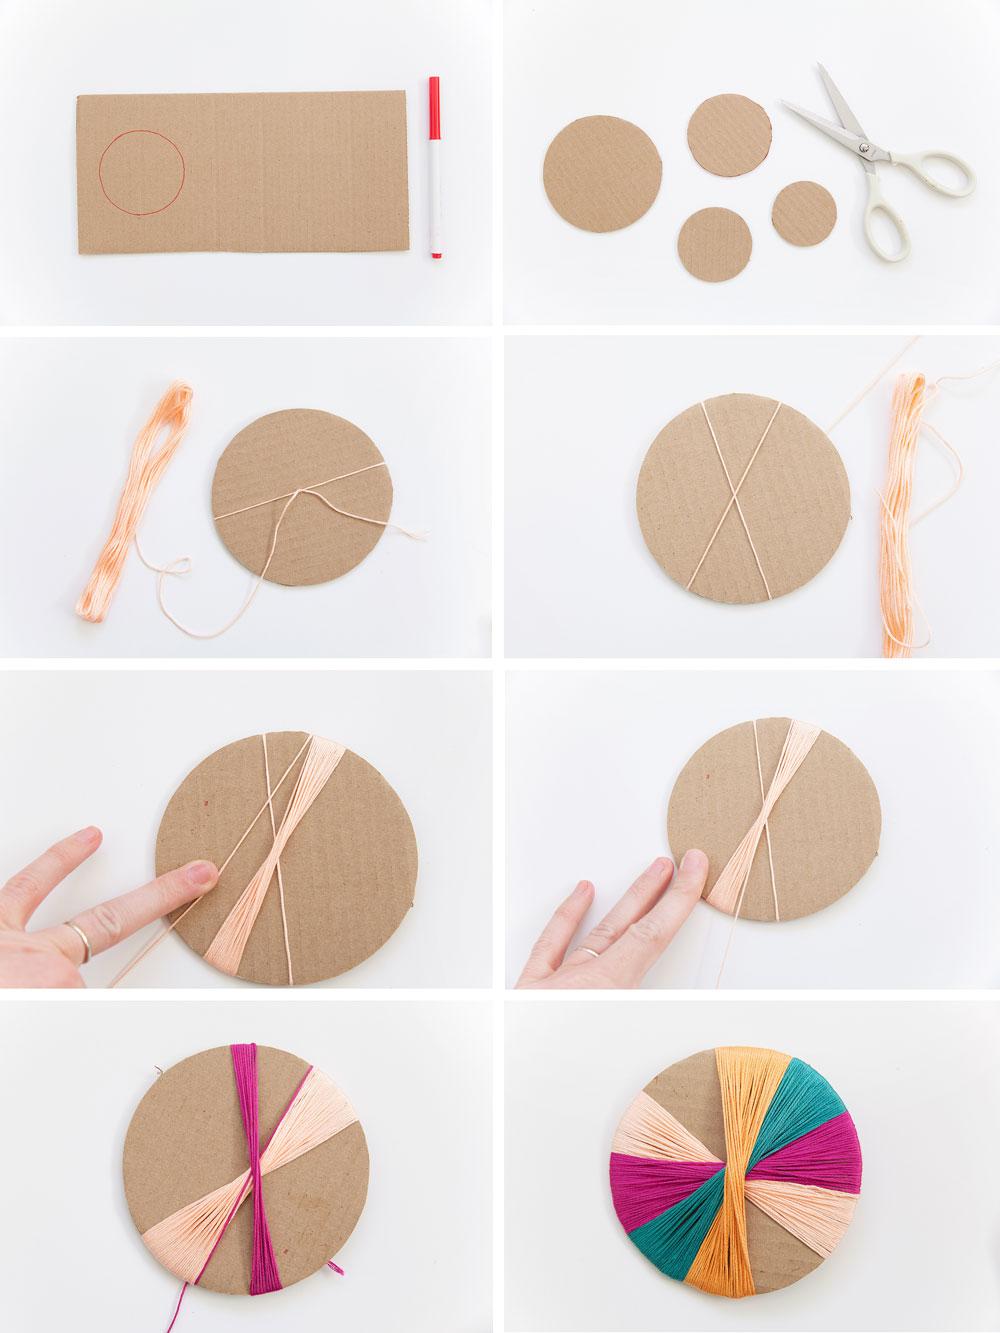 How-to-make-an-embroidery-floss-pinwheel